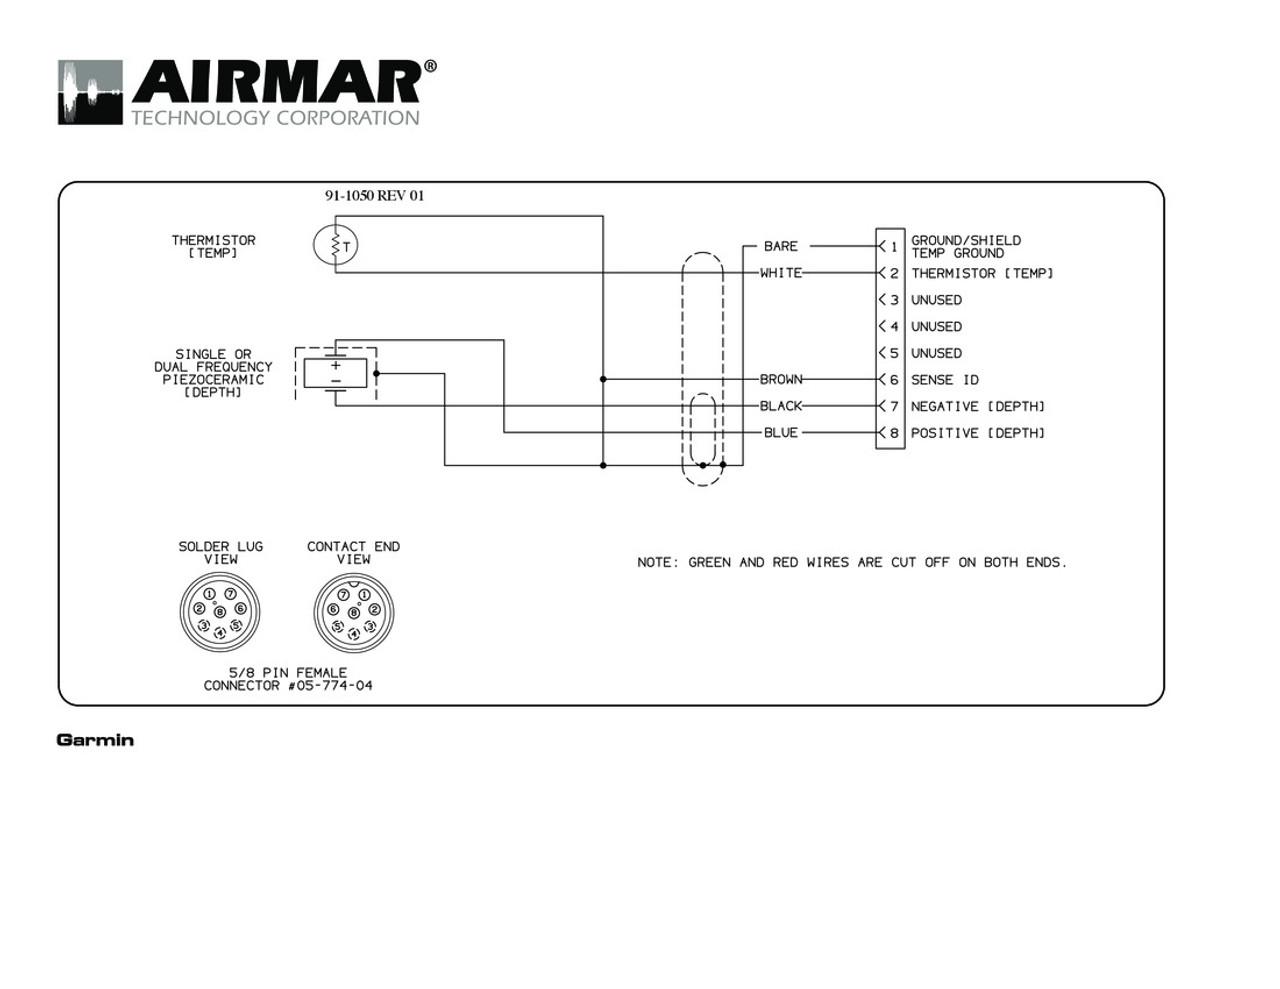 garmin 8 pin wiring diagram schematics wiring diagrams u2022 rh parntesis co